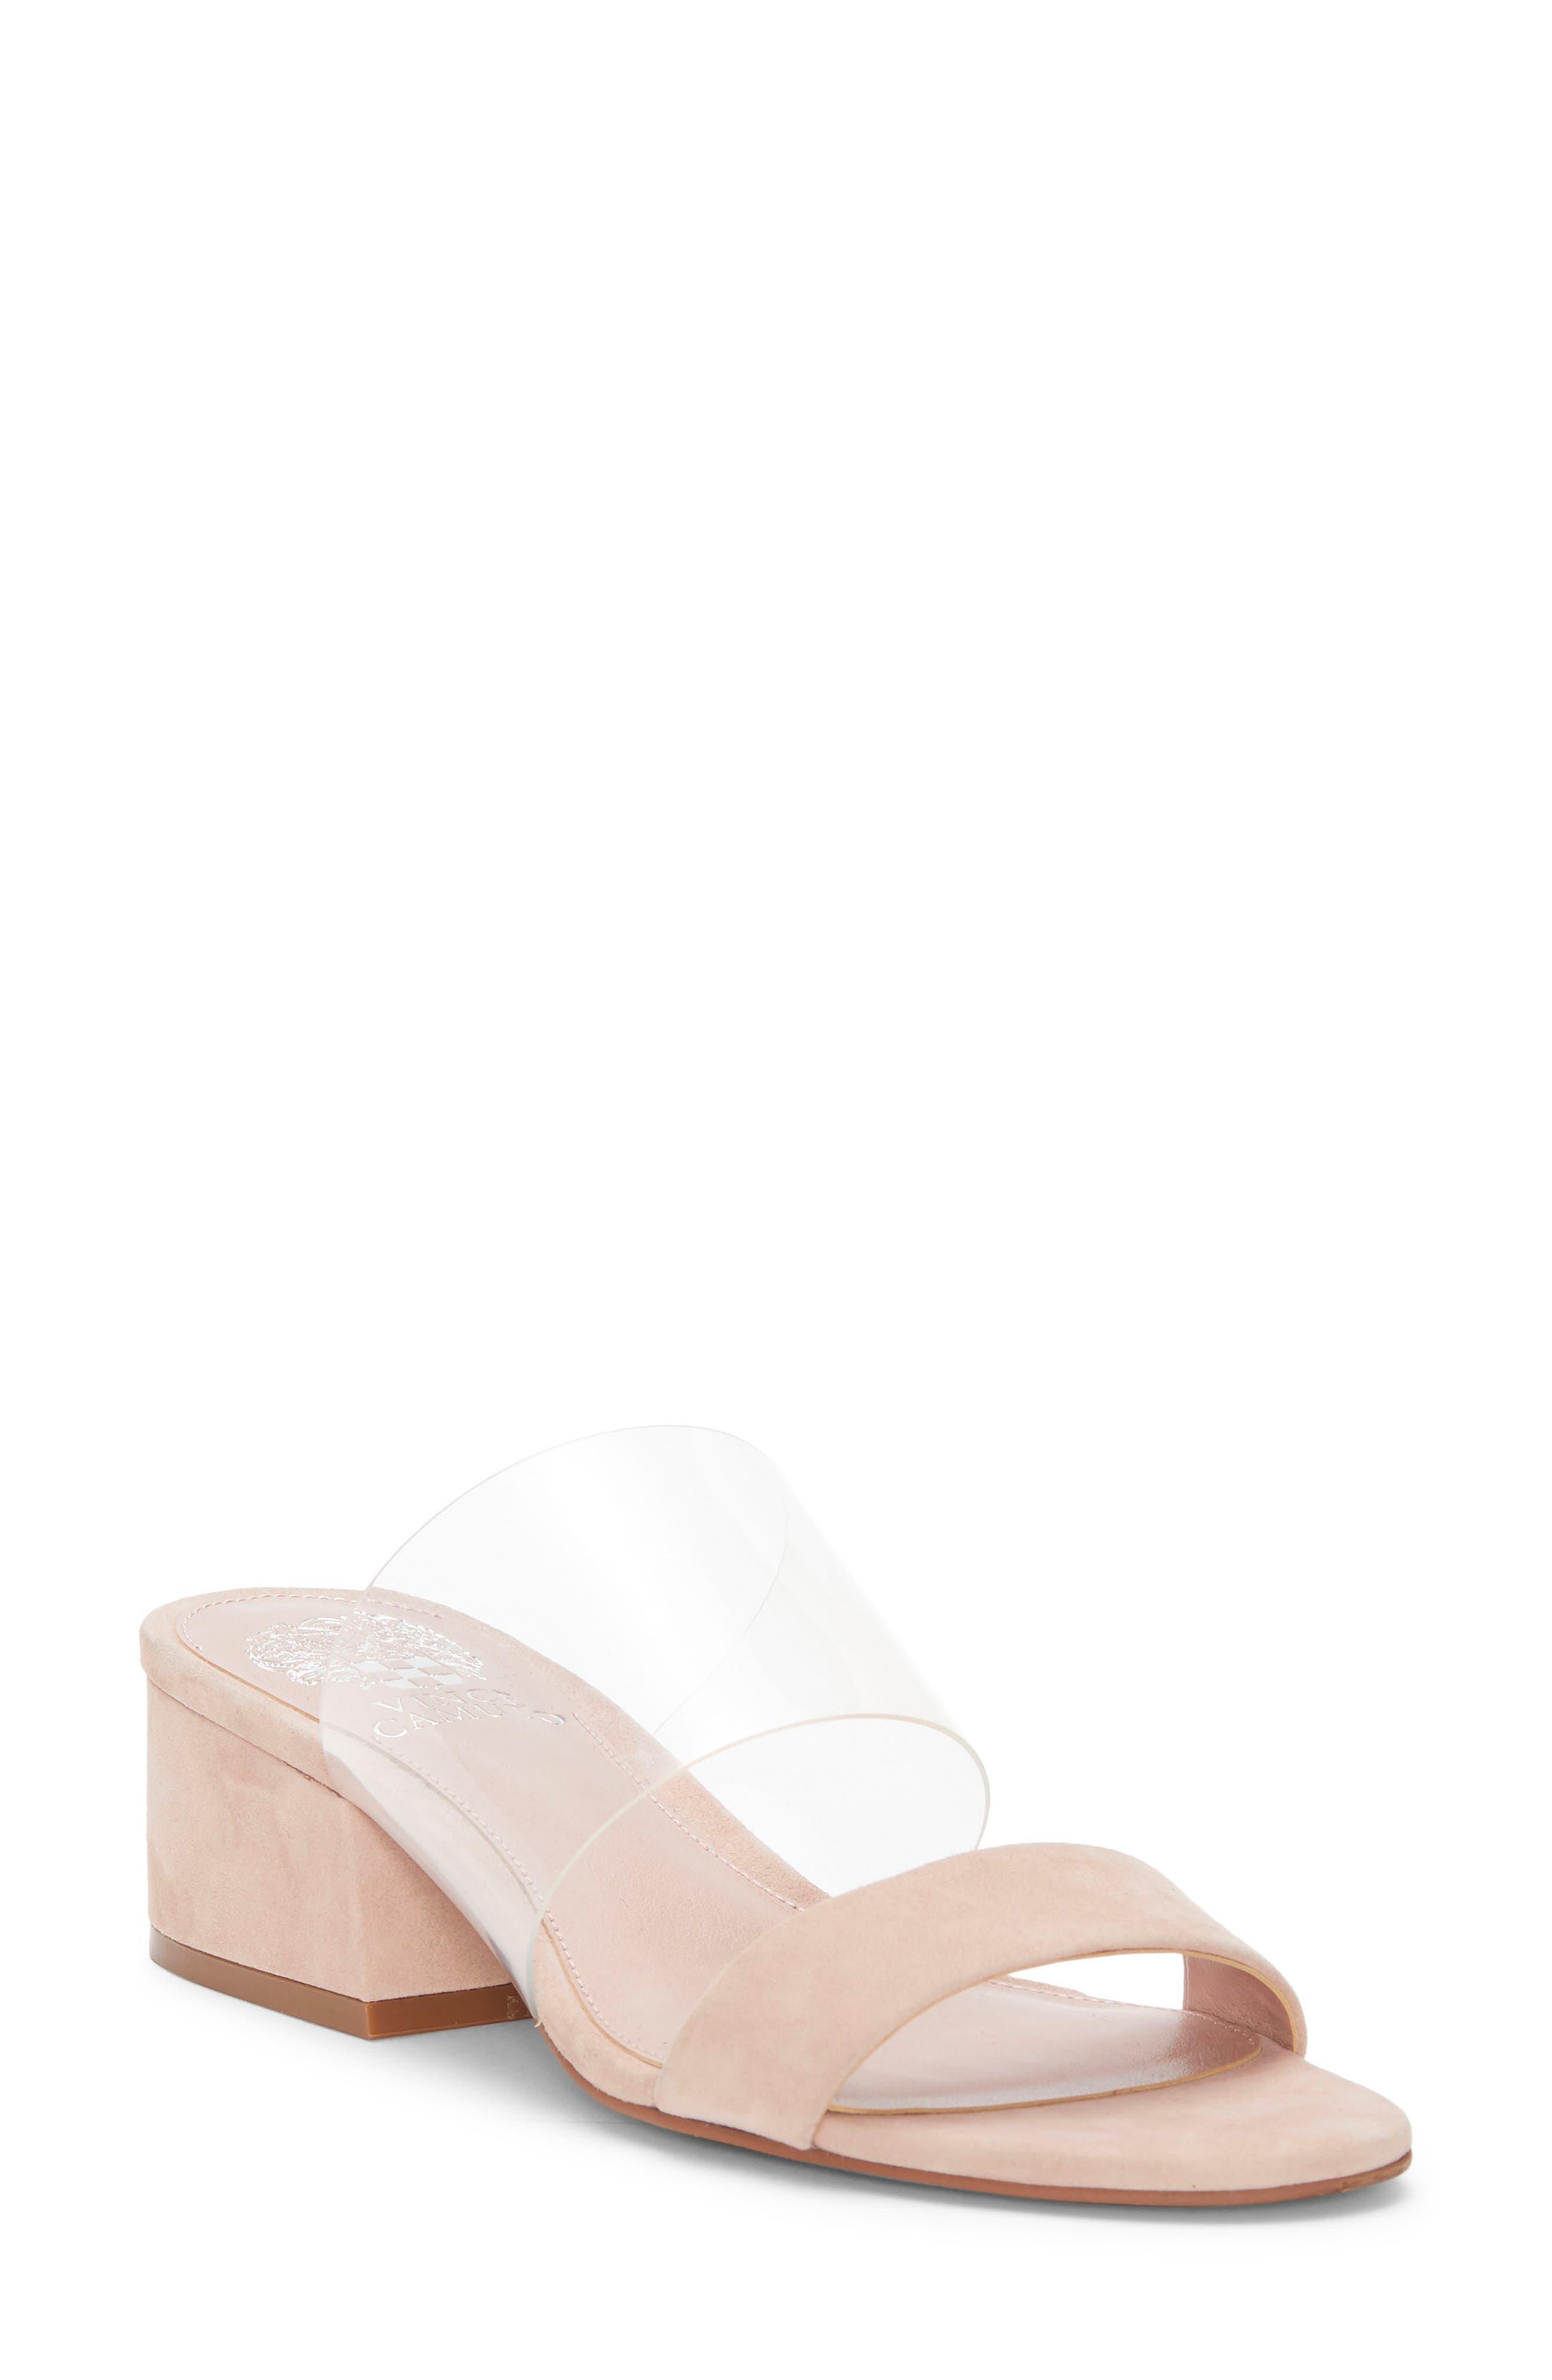 Vince Camuto Caveera Slide Sandal- Pink